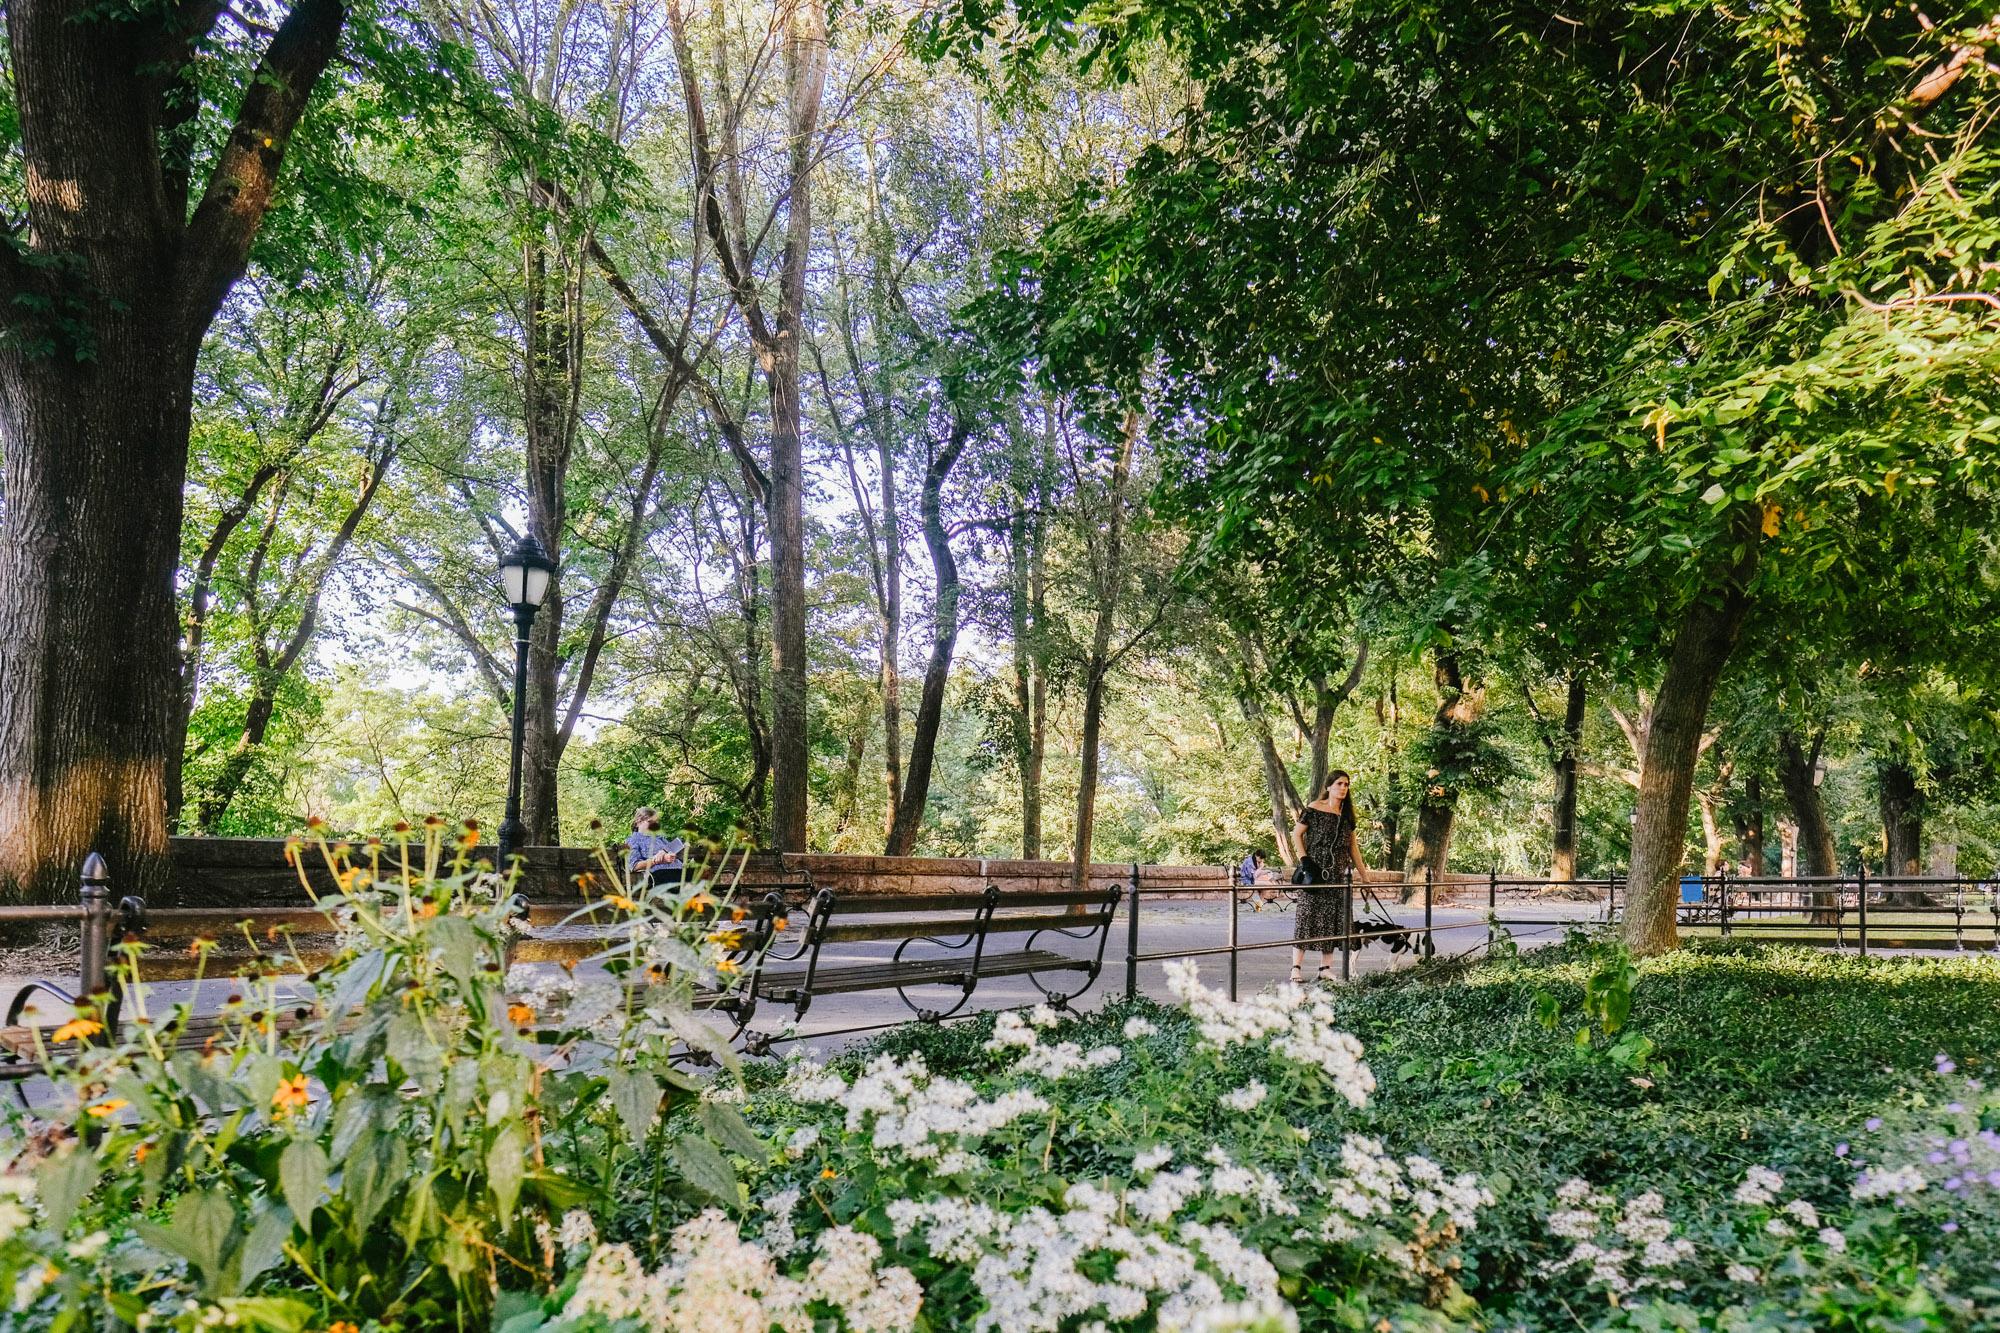 Riverside park on a summer day in Harlem. Fuji X-pro2, Fuji XF 16mm f/1.4 WR.